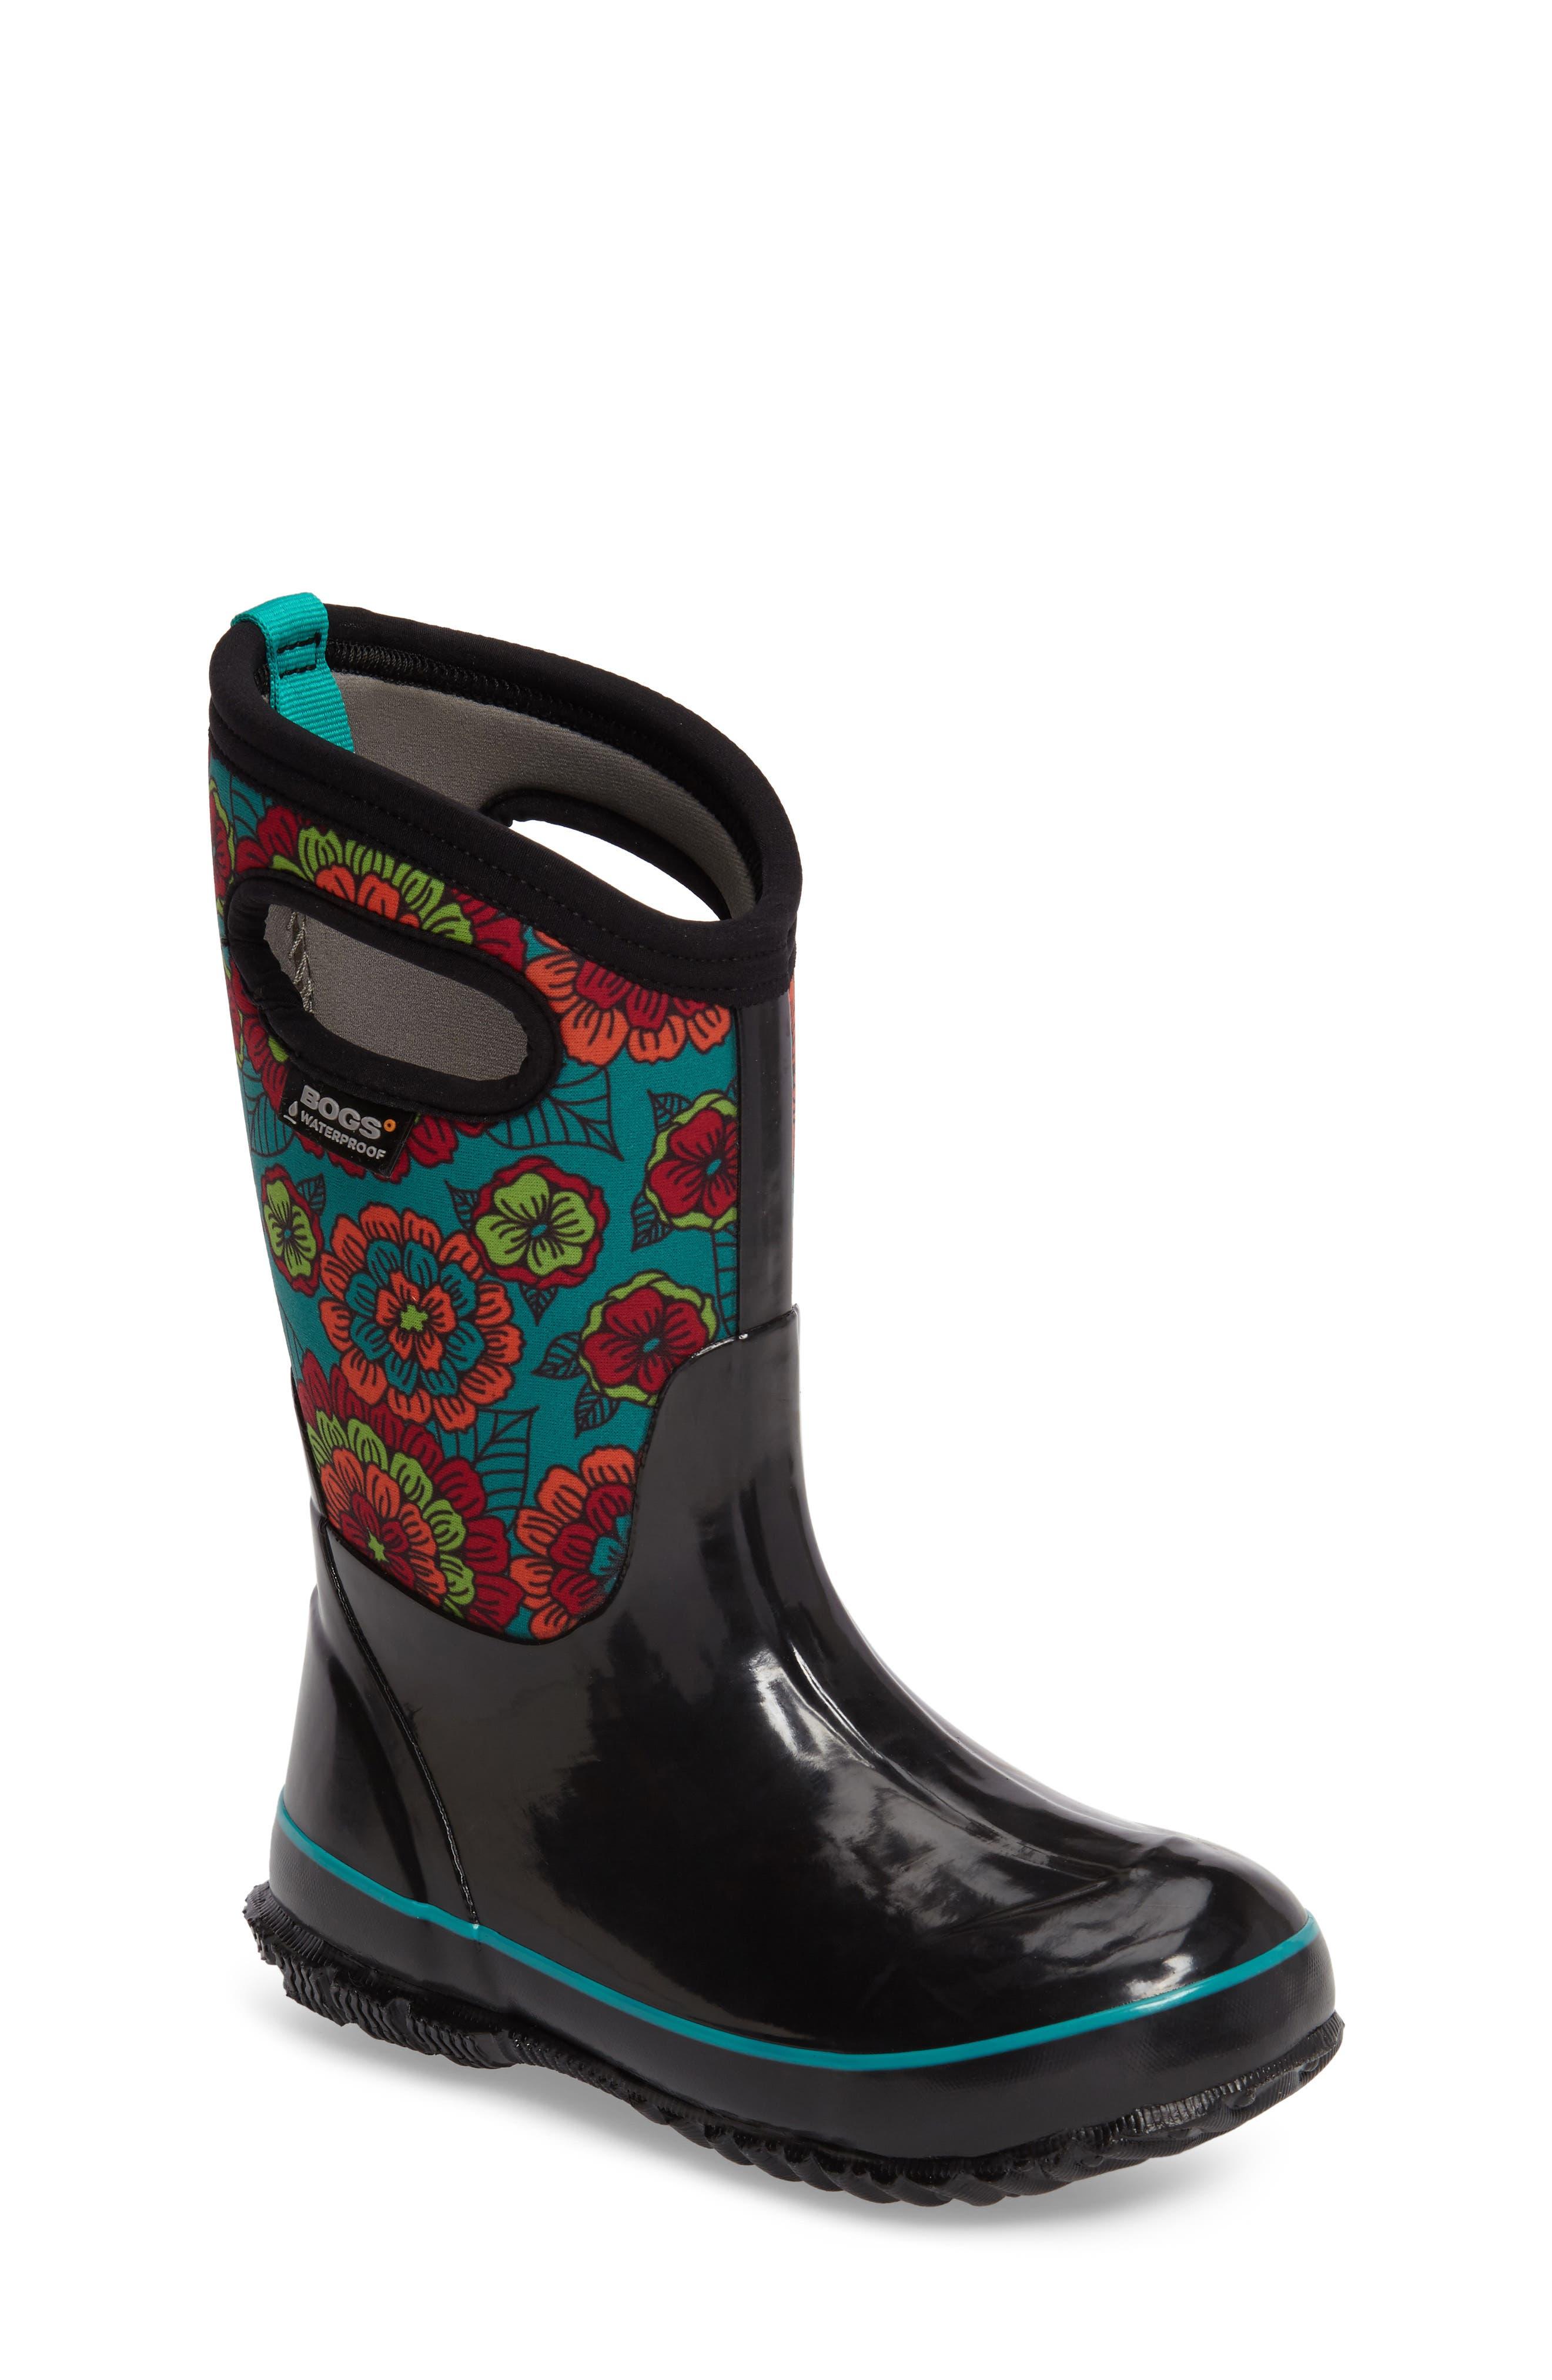 Classic Pansies Insulated Waterproof Rain Boot,                             Main thumbnail 1, color,                             BLACK MULTI